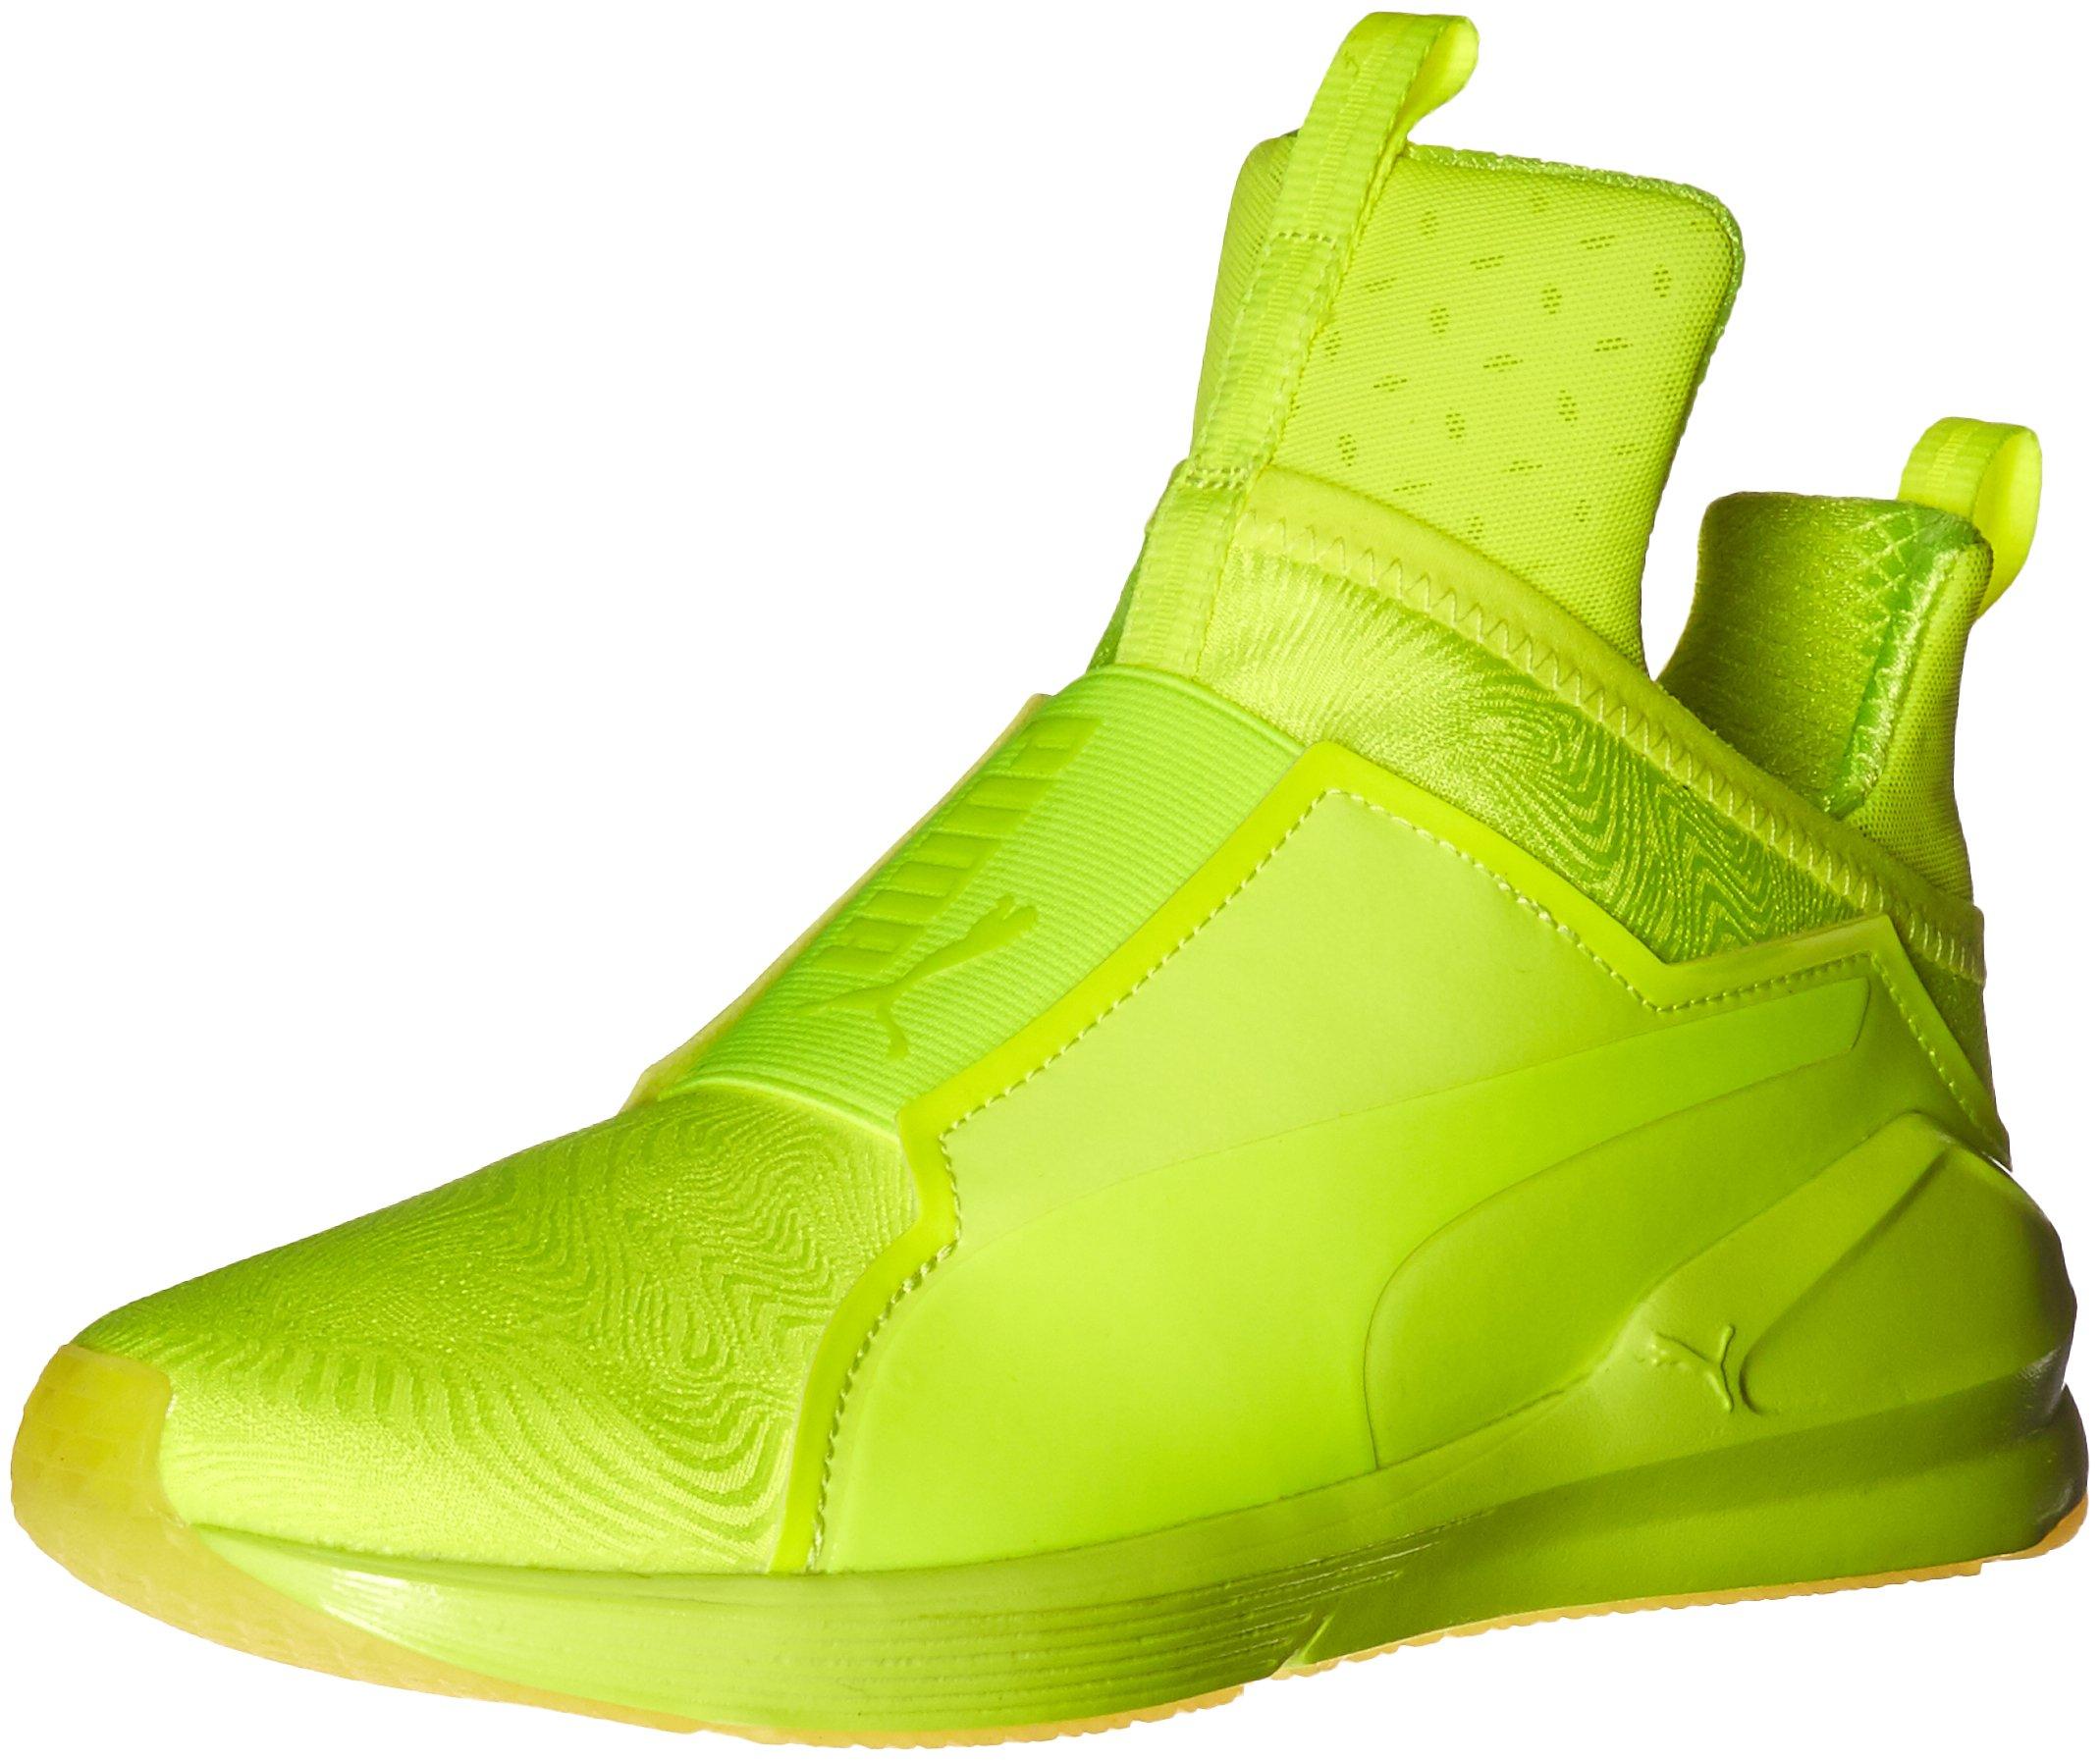 1f18f7996bfa Galleon - PUMA Women s Fierce Bright Cross-Trainer Shoe Safety Yellow